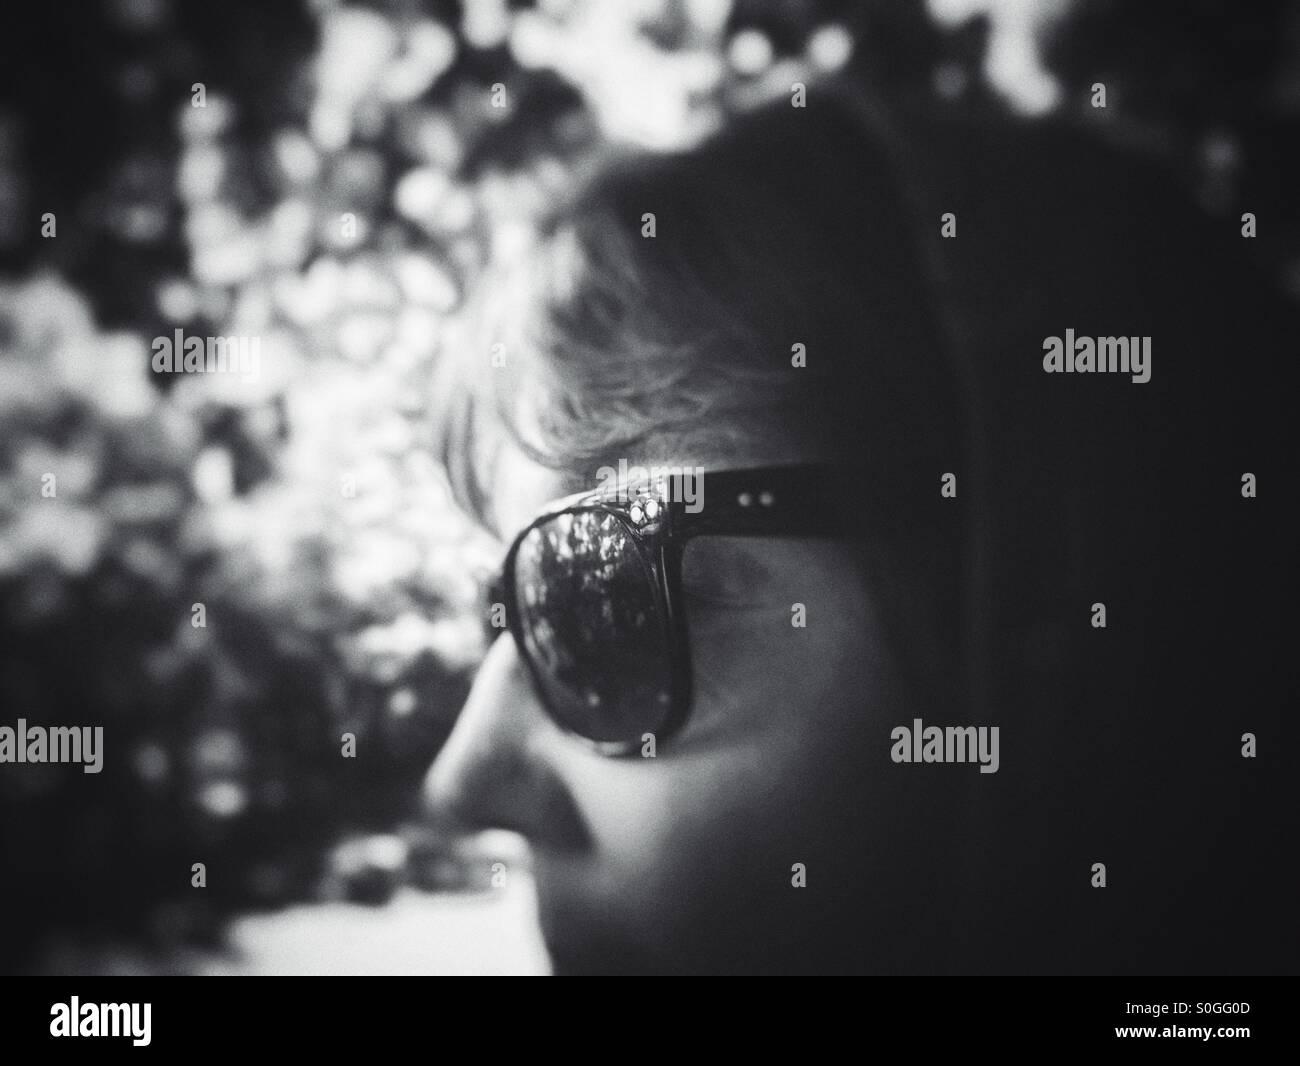 eyes, eyewear, fashion, people, portrait, sunglasses, women, dark, ray ban, middle, age, aged, enigmatic, shades - Stock Image